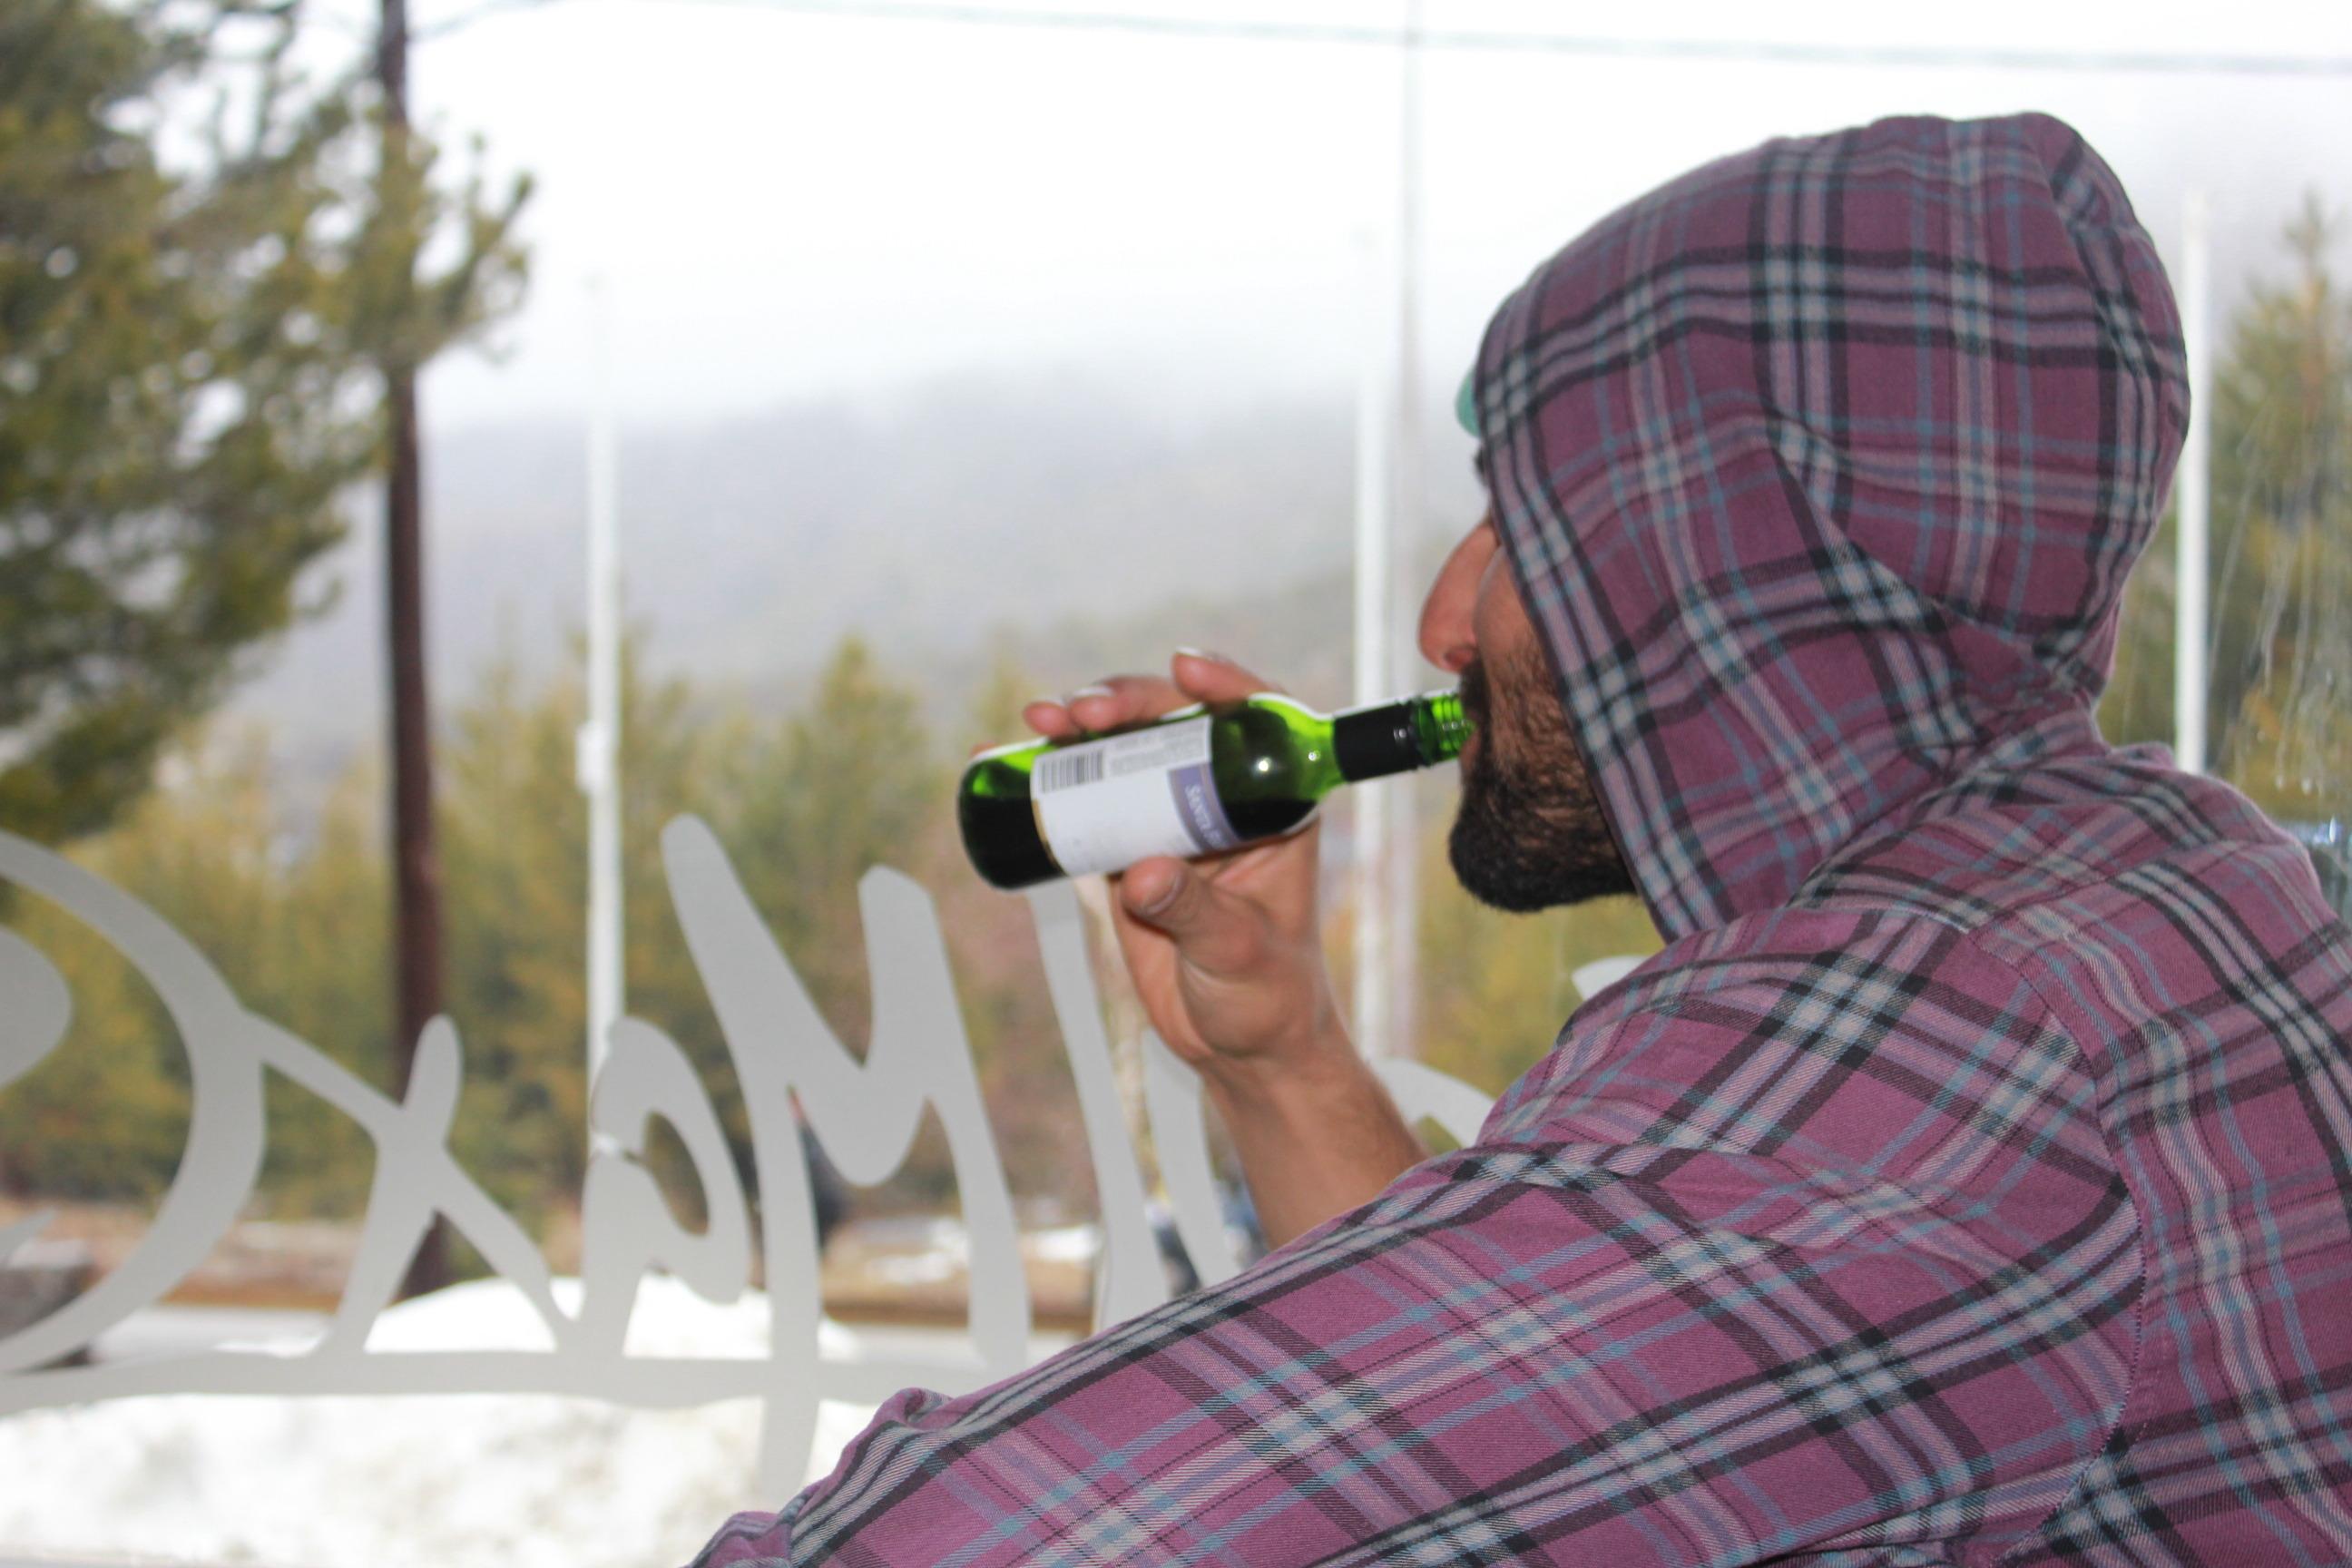 Tony Pavlantos drinks Malbec